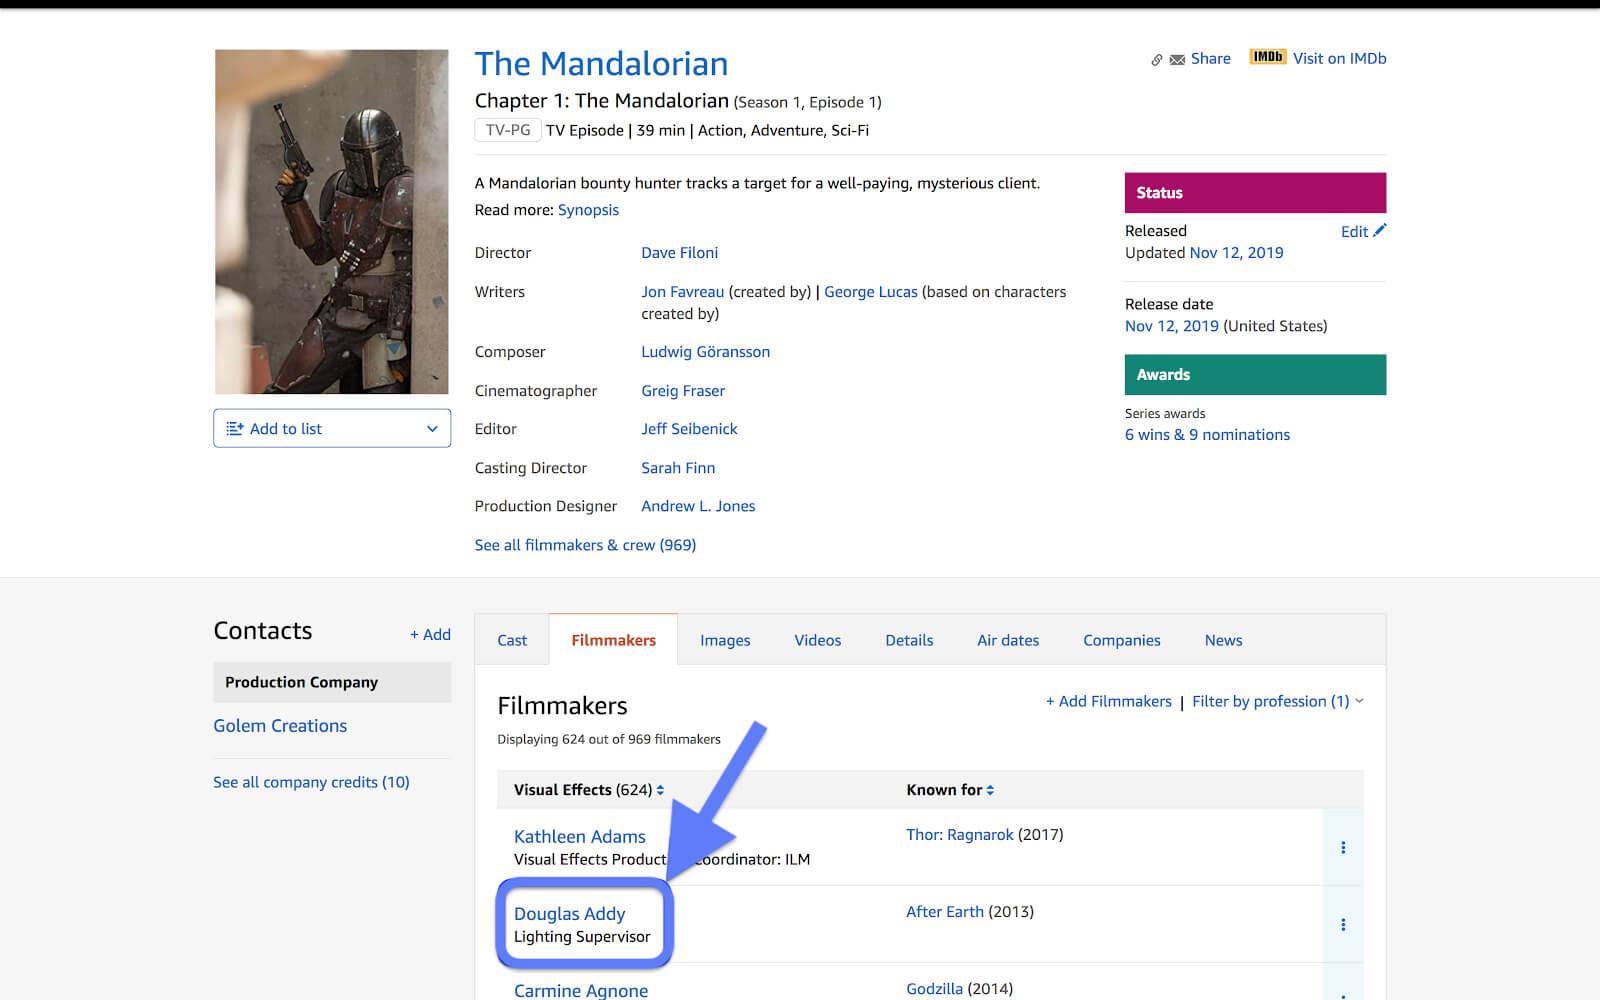 IMDb pro The Mandalorian - Visual effects department